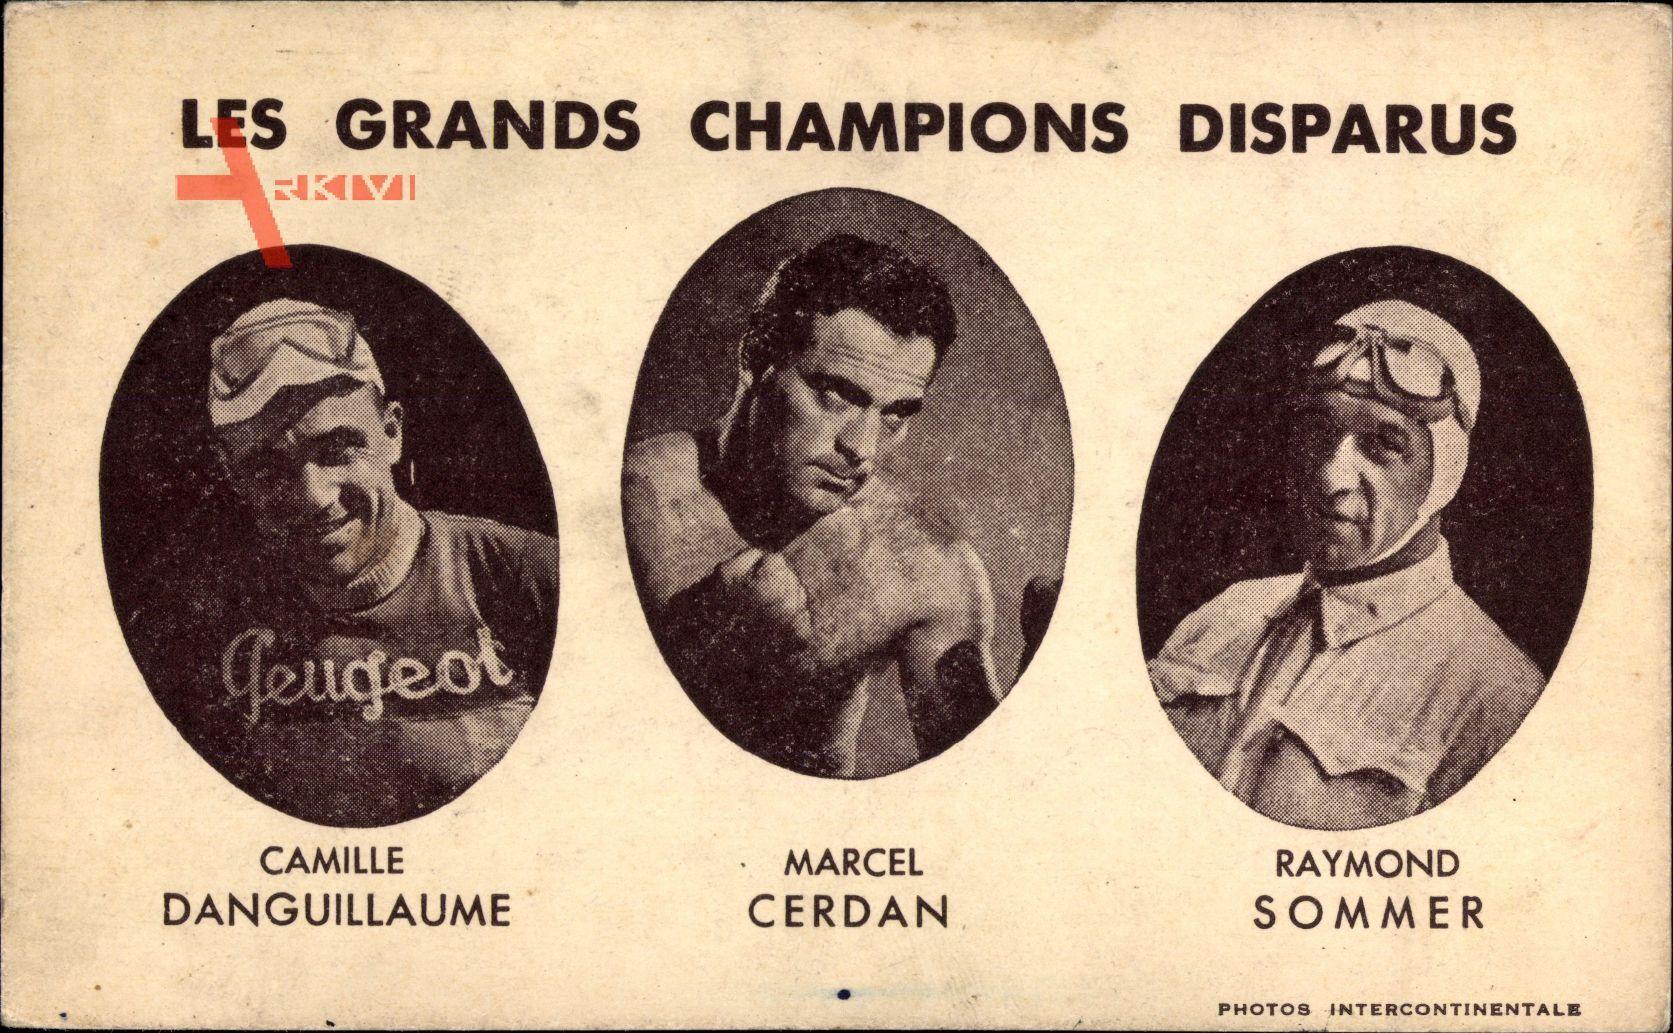 Grands Champions Disparus, Camille Danguillaume, Marcel Cerdan,Raymond Sommer